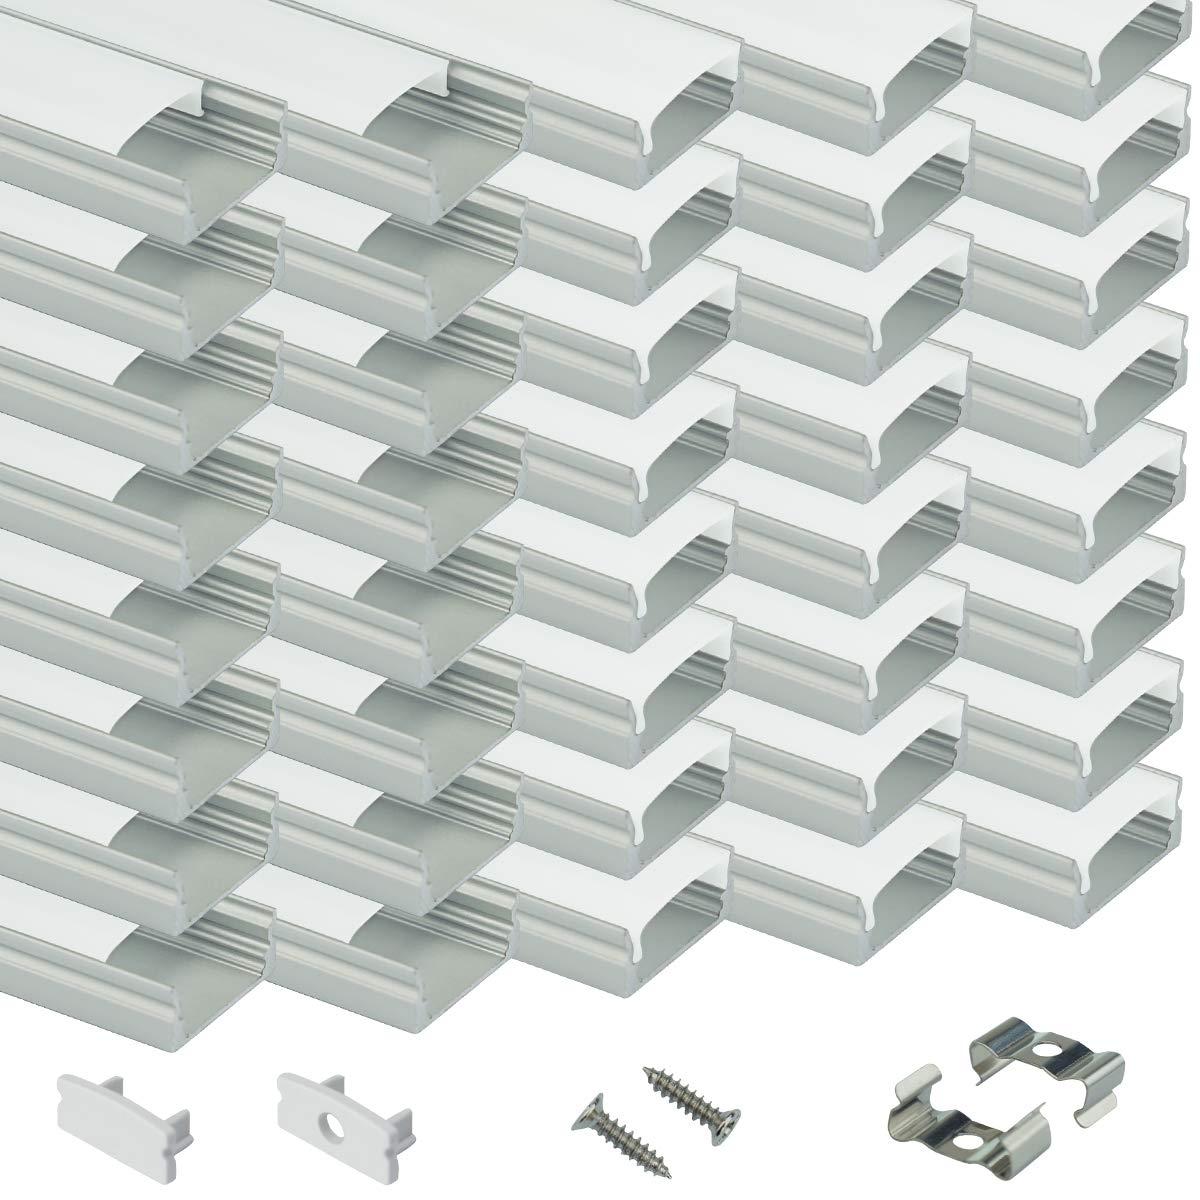 Muzata LED Channel System with Milky Cover Lense,LED Aluminum Profile Housing for Strip Tape Light Diffuser Track Segments U1SW 40PCS 3.3ft/1M U Shape